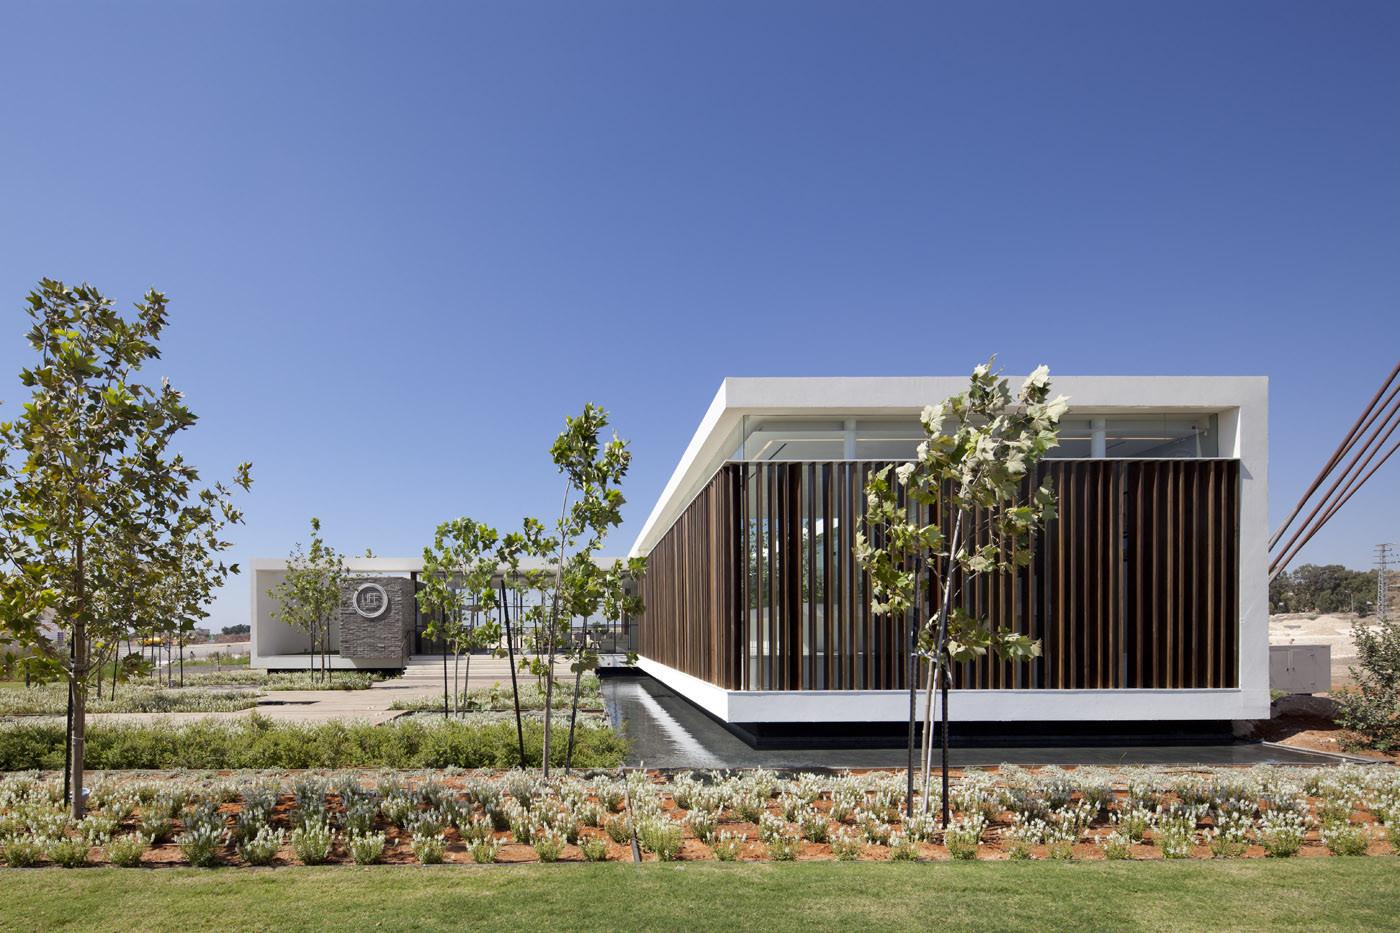 Pavilion 2012 / Pitsou kedem architects, © Amit Geron